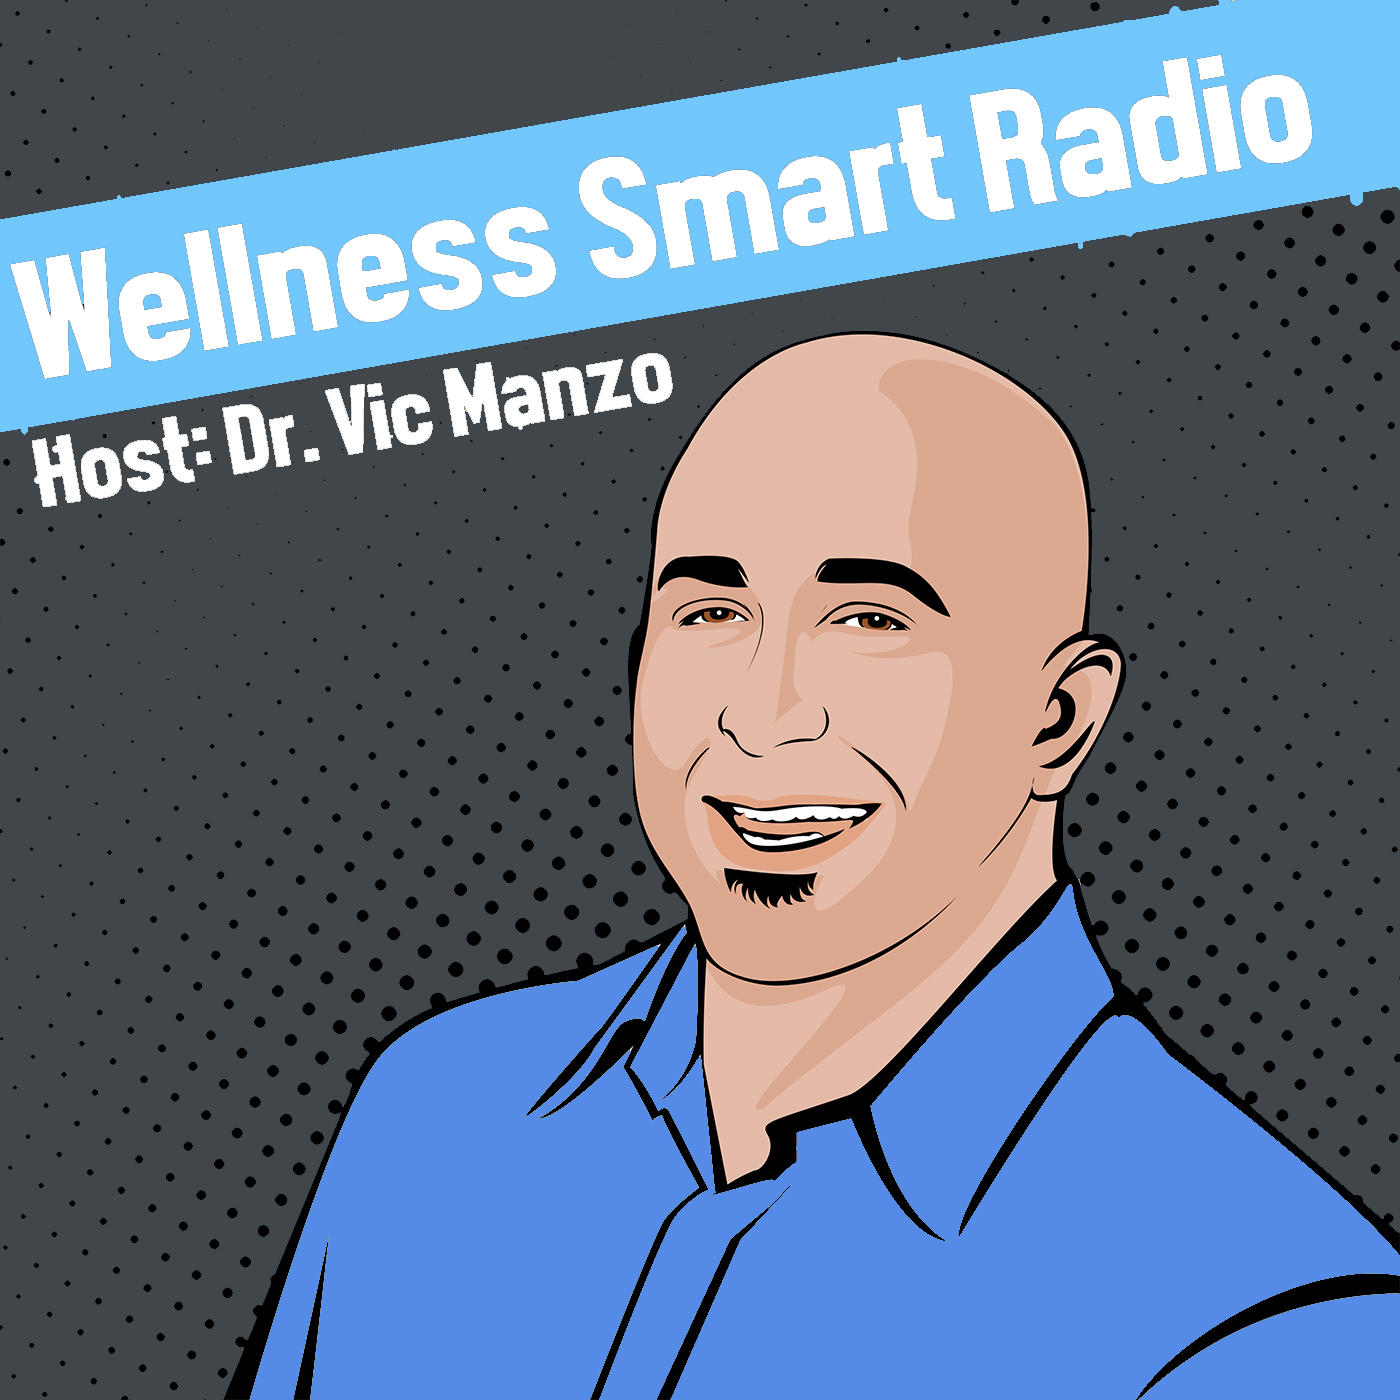 Wellness Smart Radio